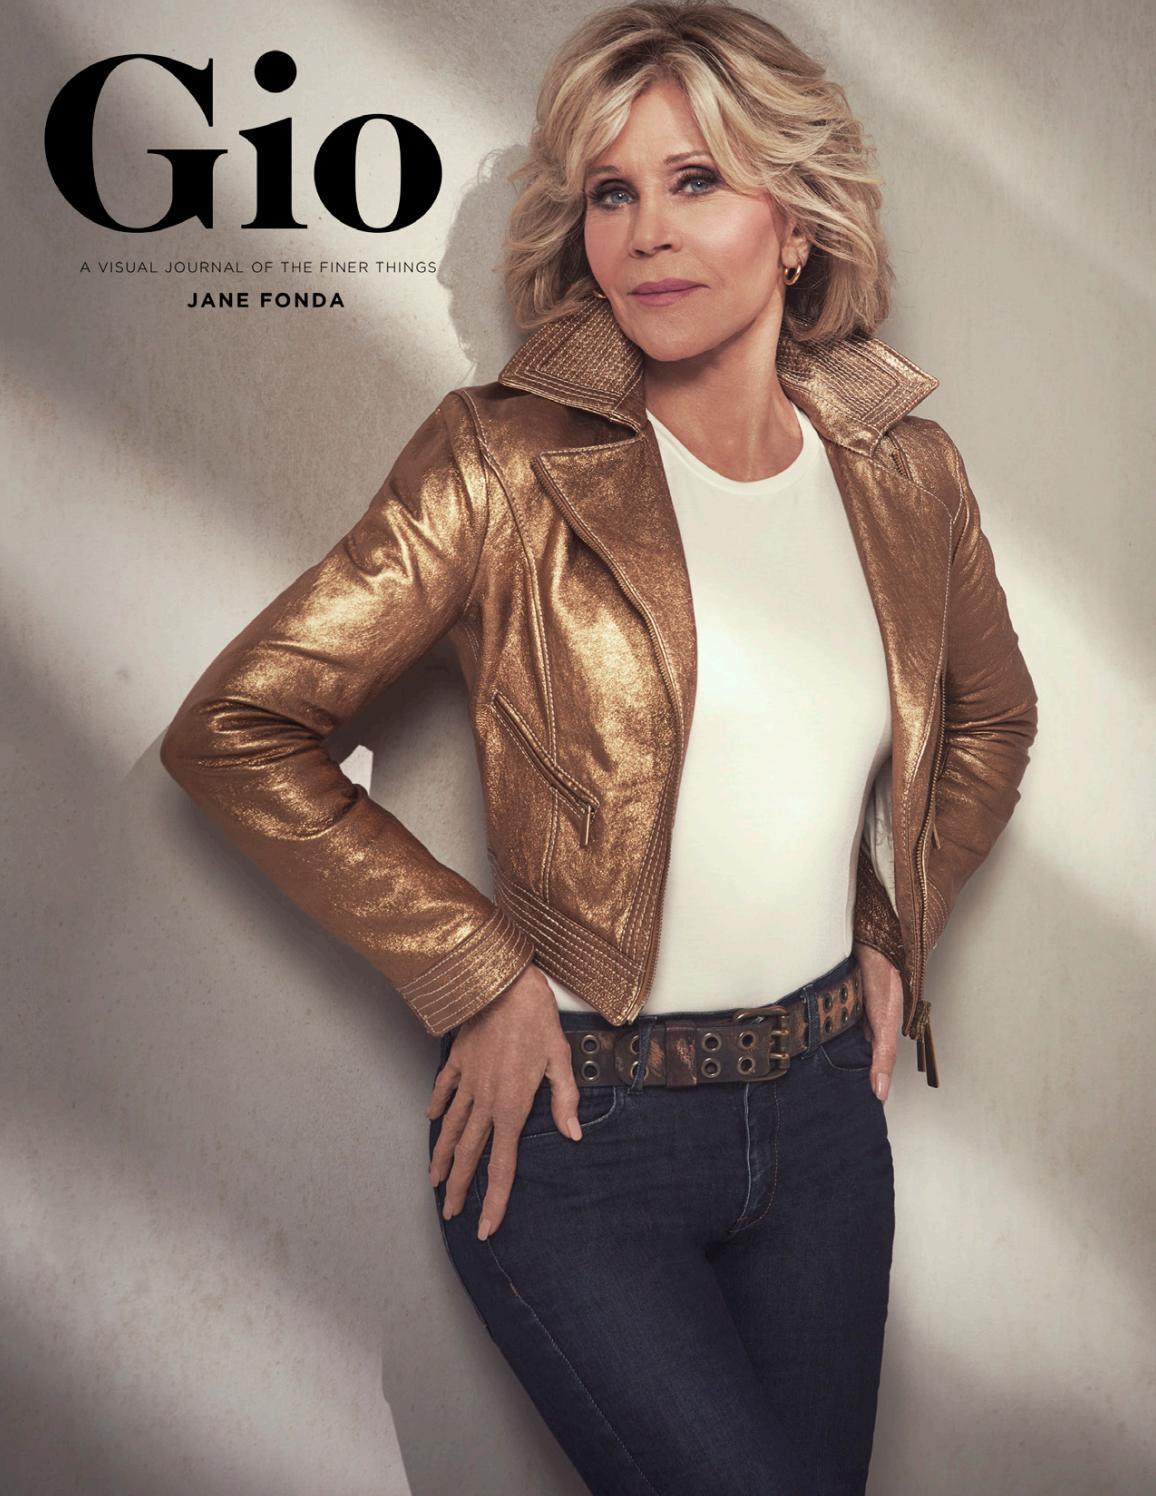 Gio Journal Issue 5 Jane Fonda By Giojournal Issuu